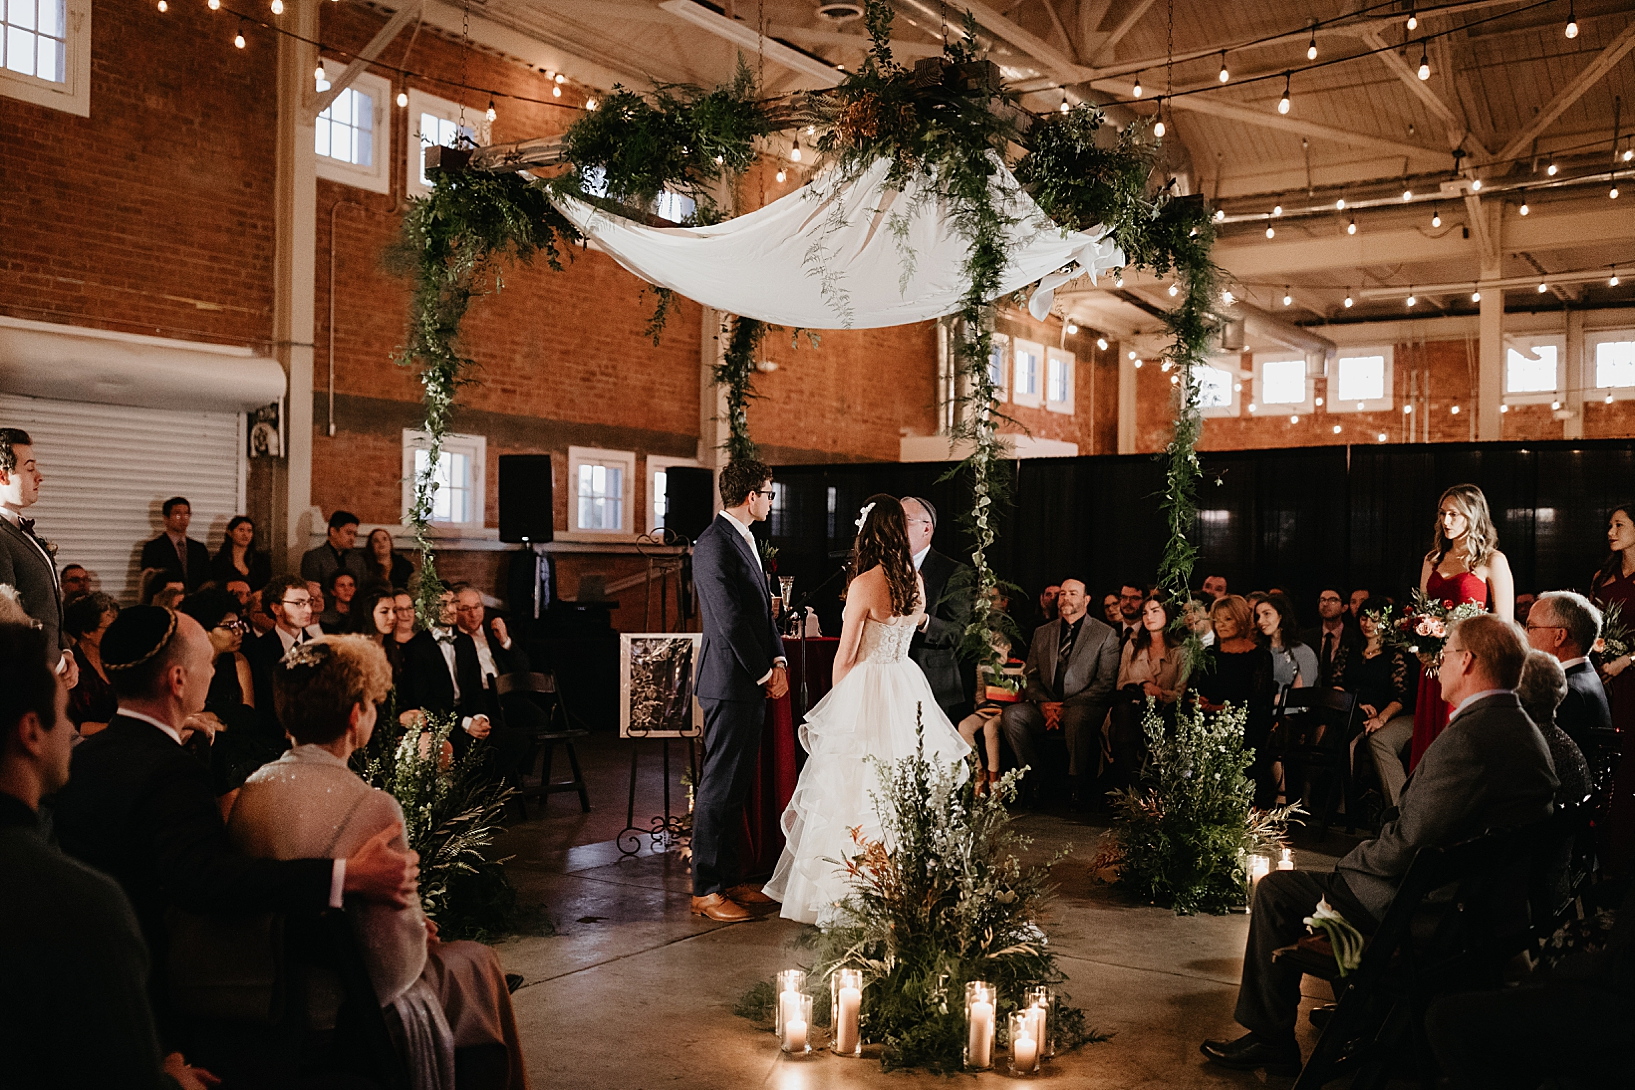 Brick-San-Diego-Winter-Wedding-52.jpg